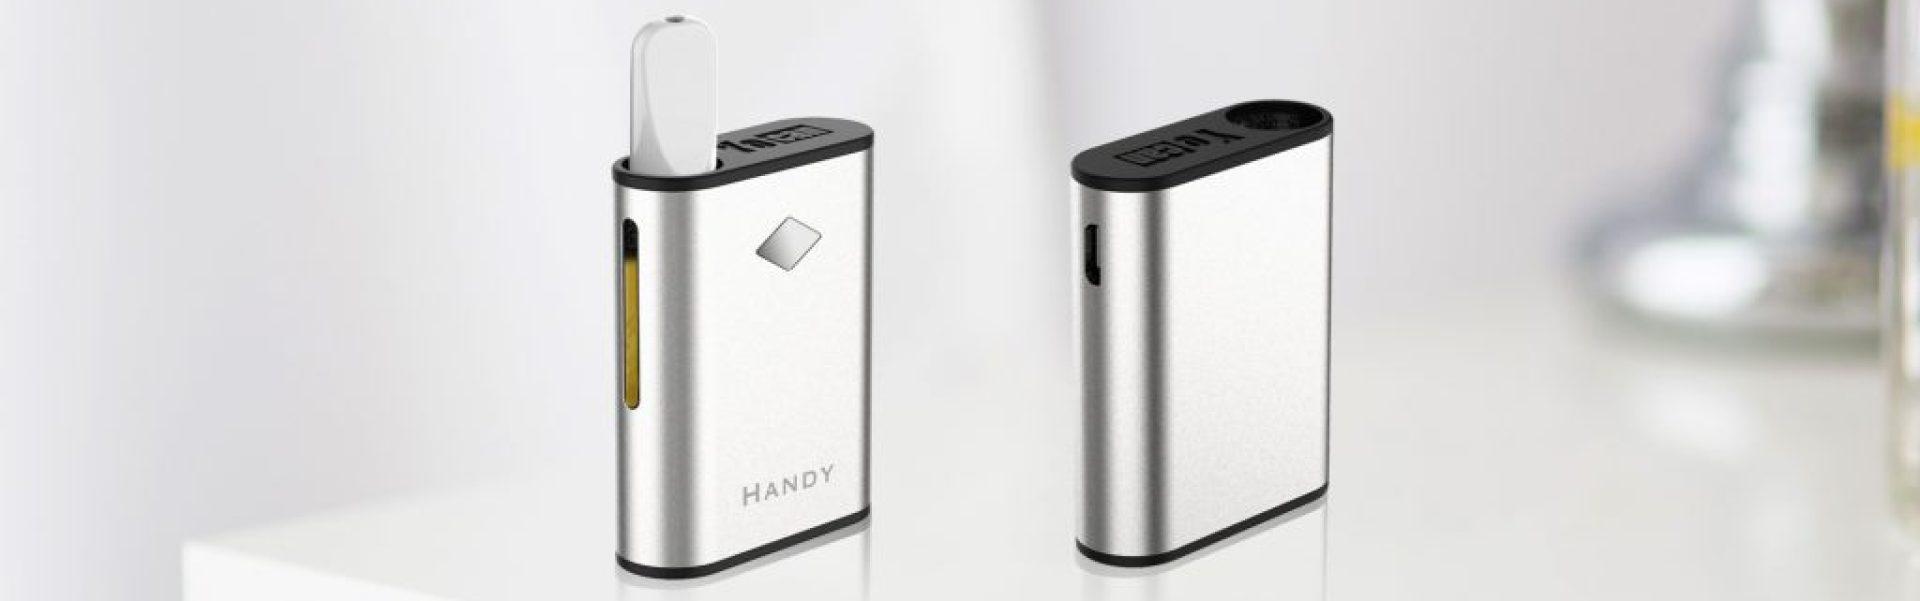 Yocan Handy Vape Battery Window & USB Charging.